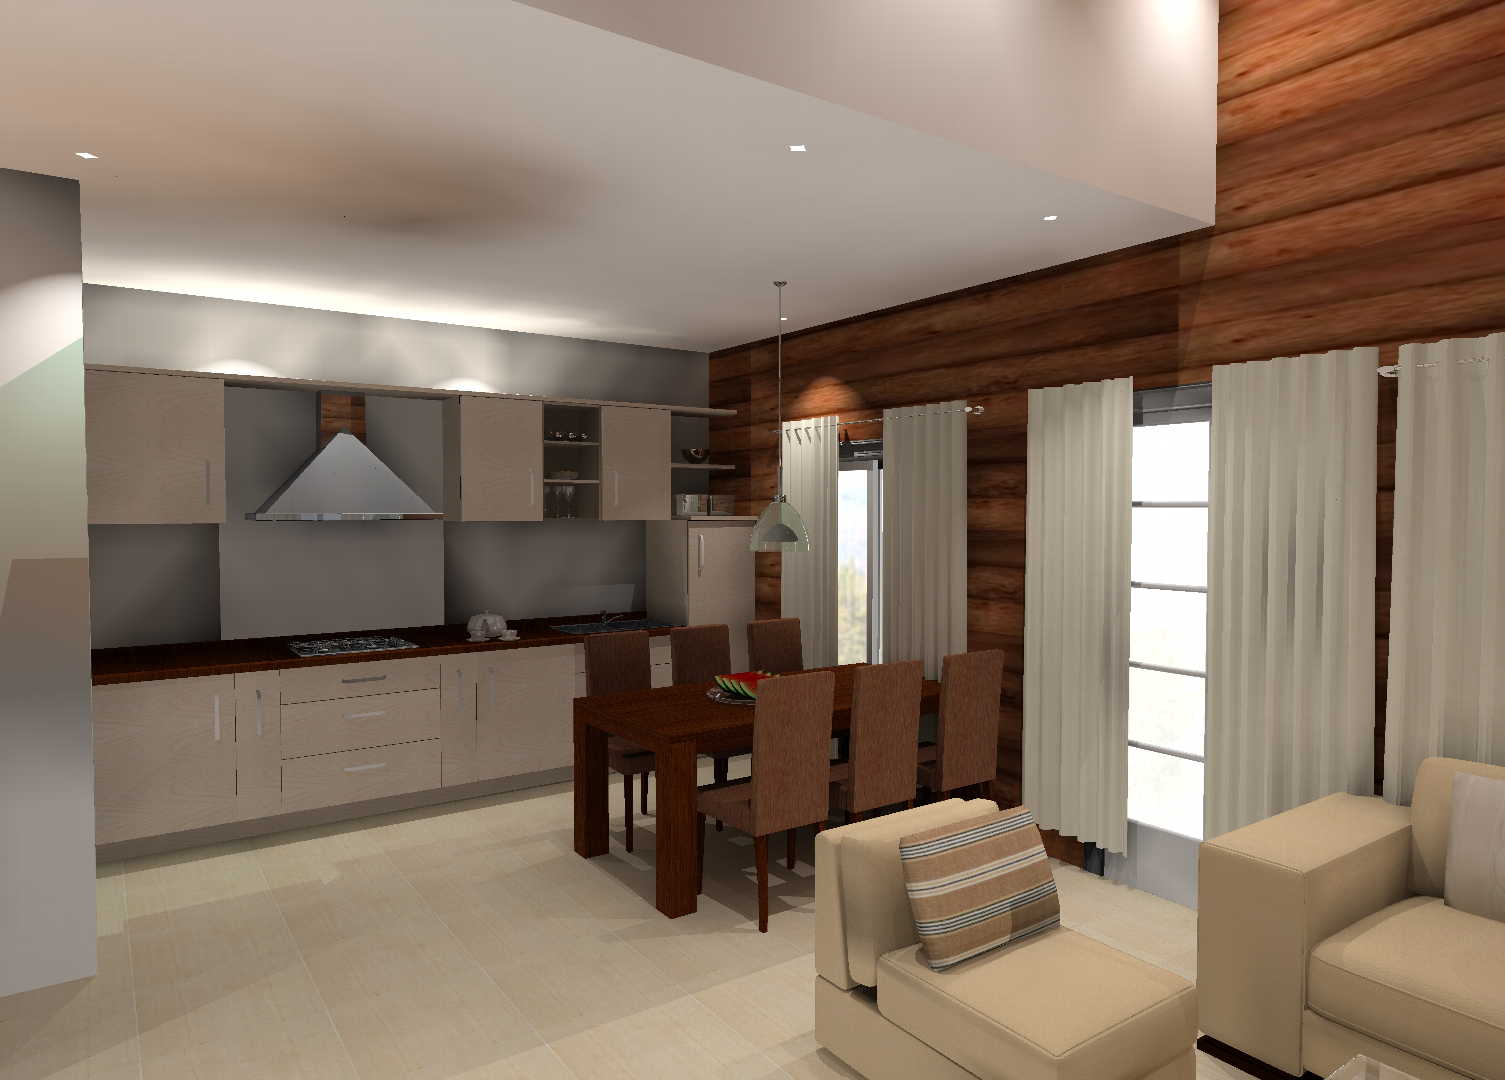 Moderni olohuone keittiö ruokailutila, Sisustus  olohuone  ruokailutila  k